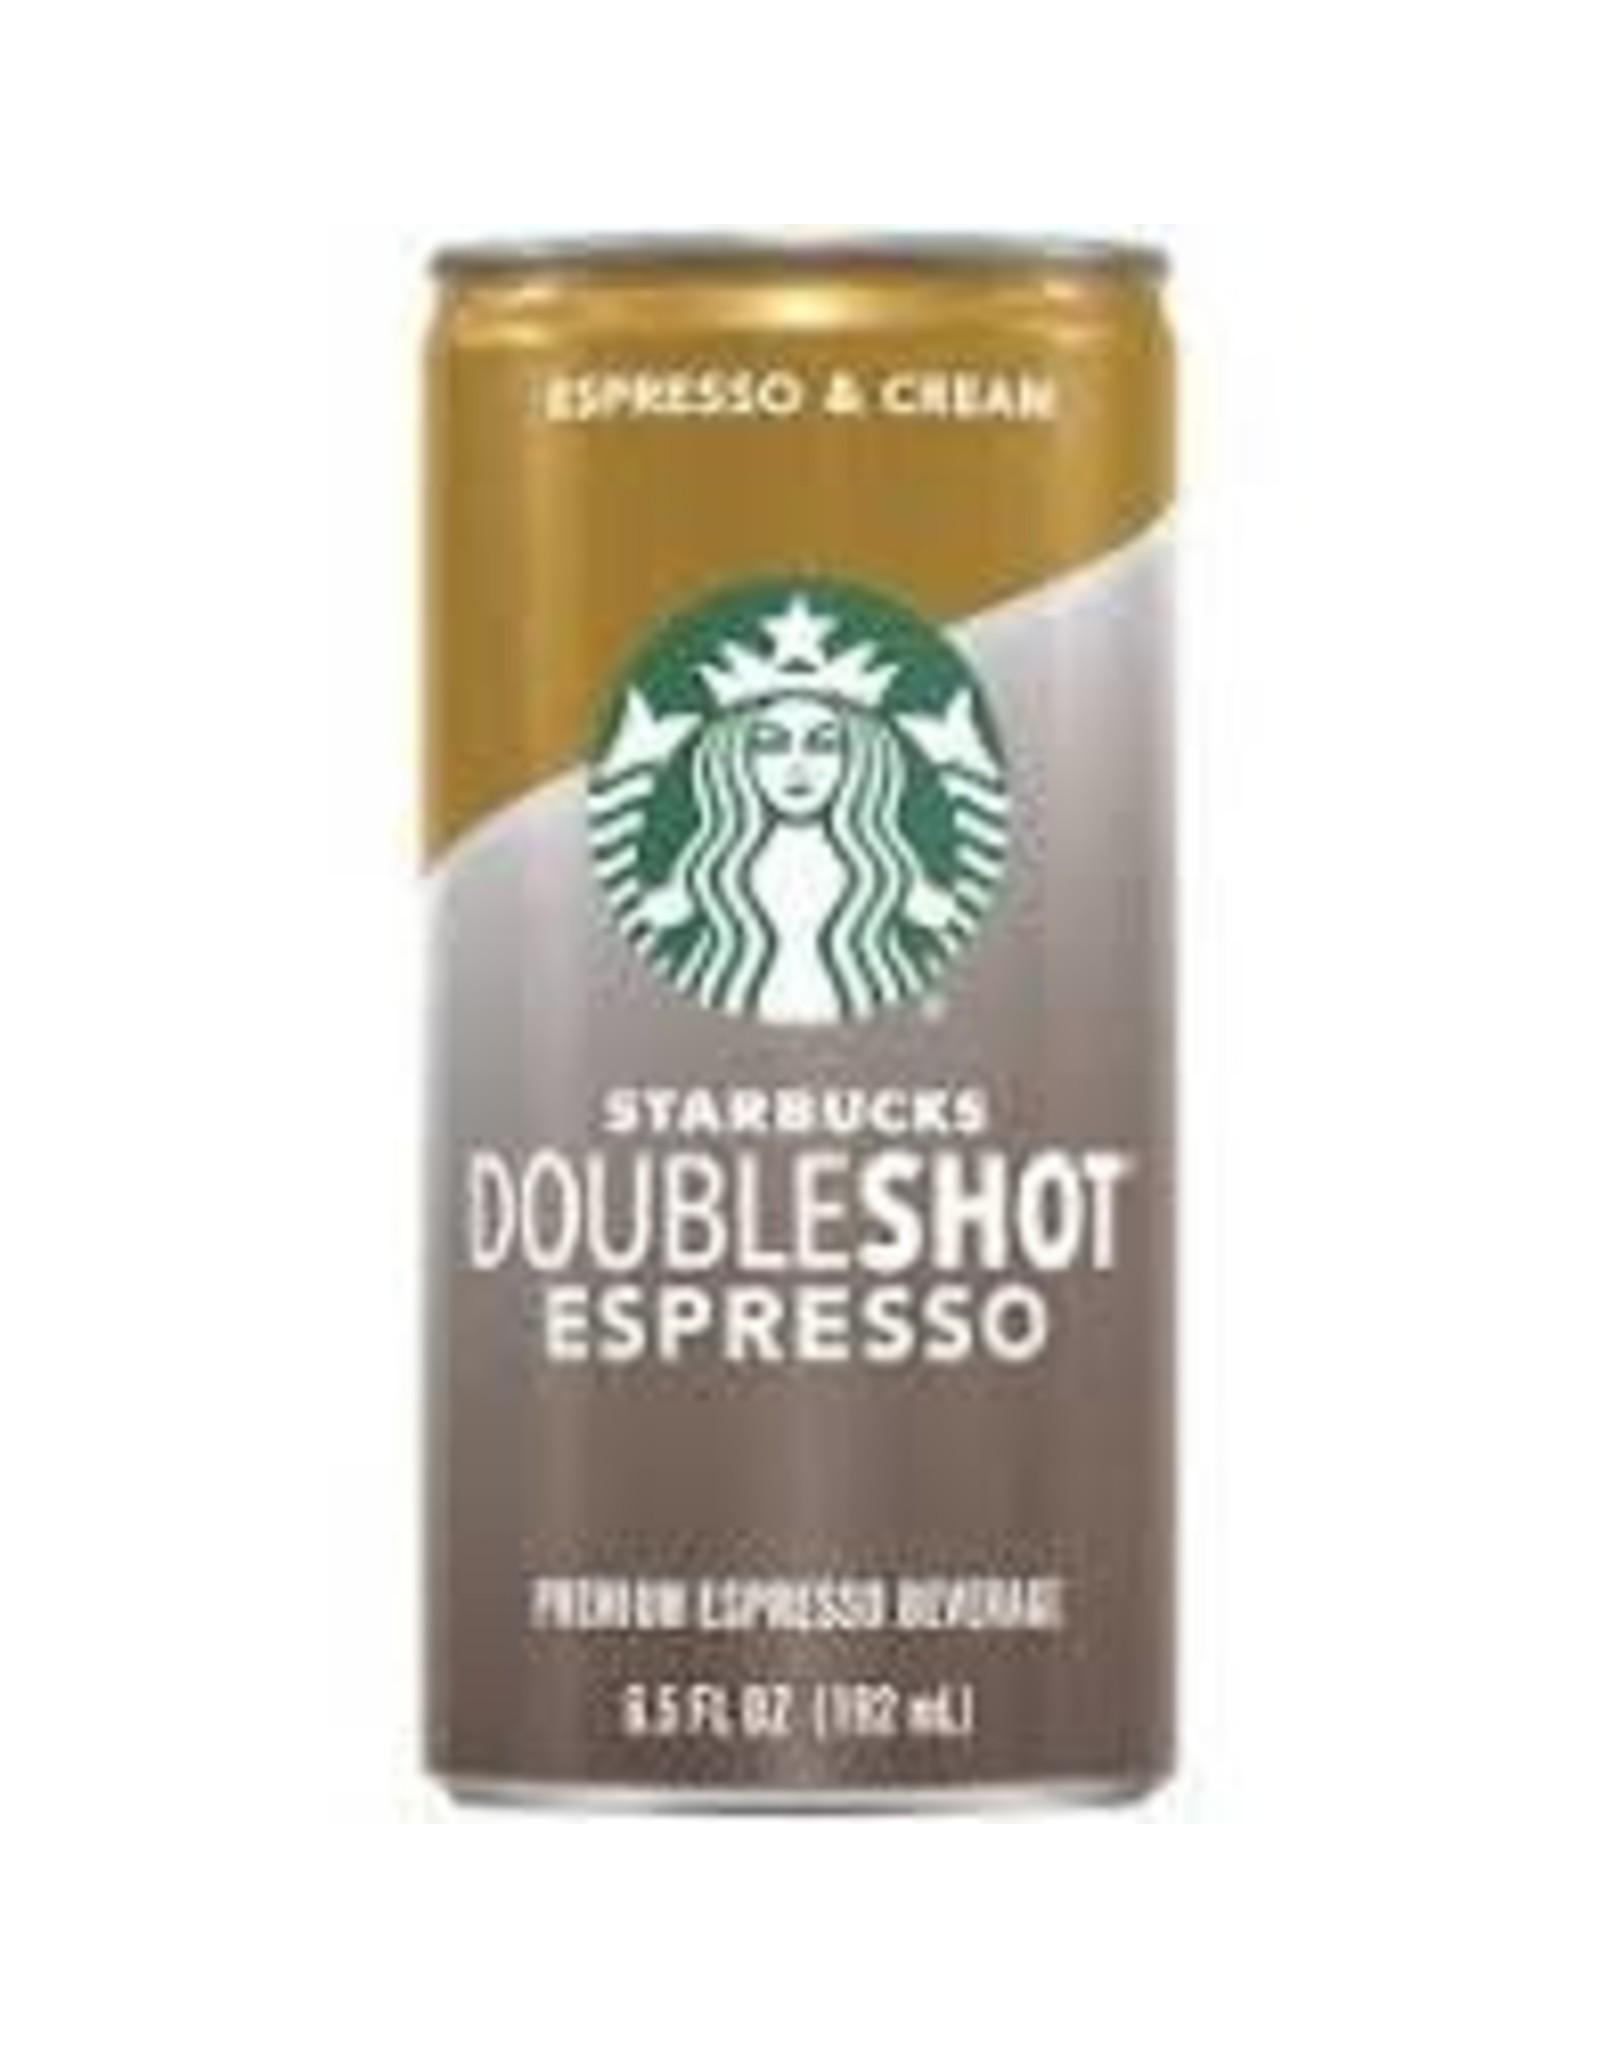 STARBUCKS DOUBLESHOT ESPRESSO 6.5OZ CAN